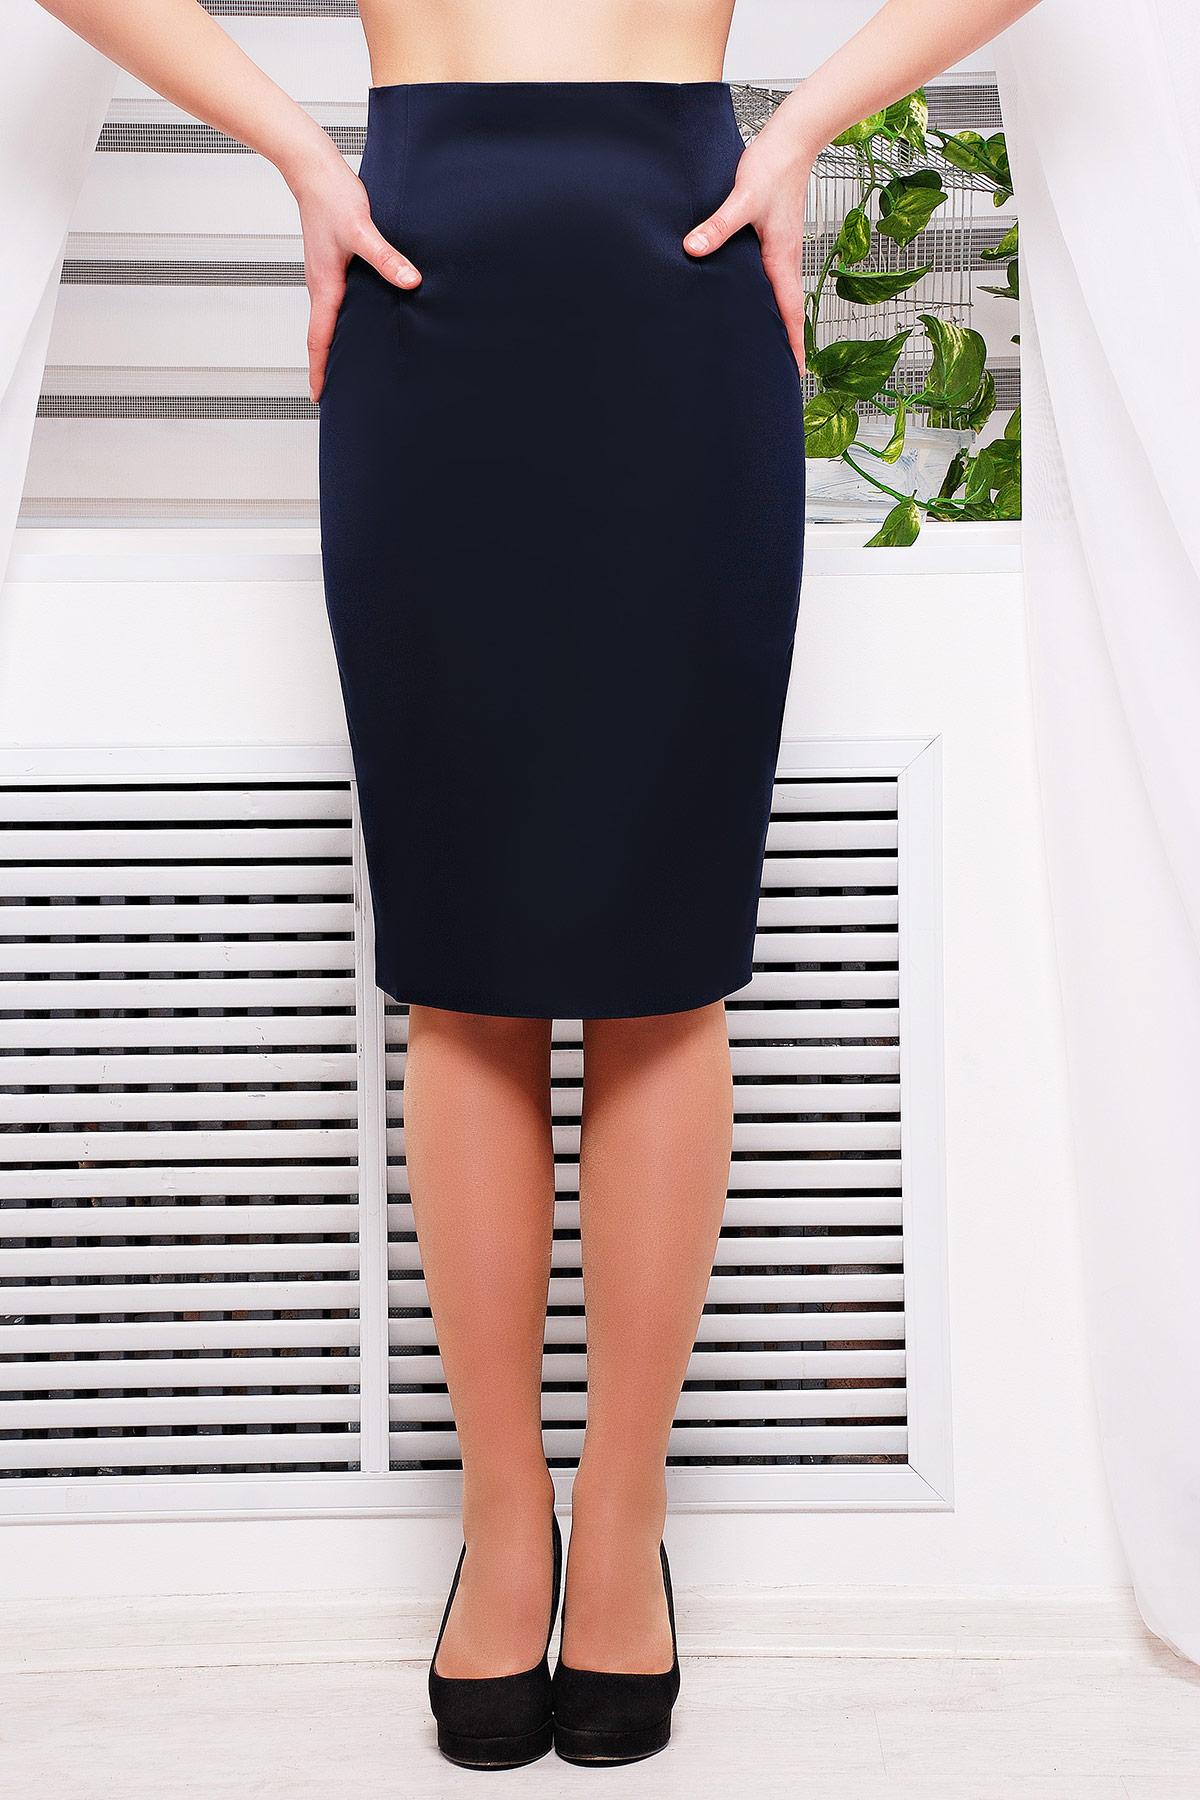 юбка-карандаш черного цвета. юбка мод. №11. Цвет: темно синий